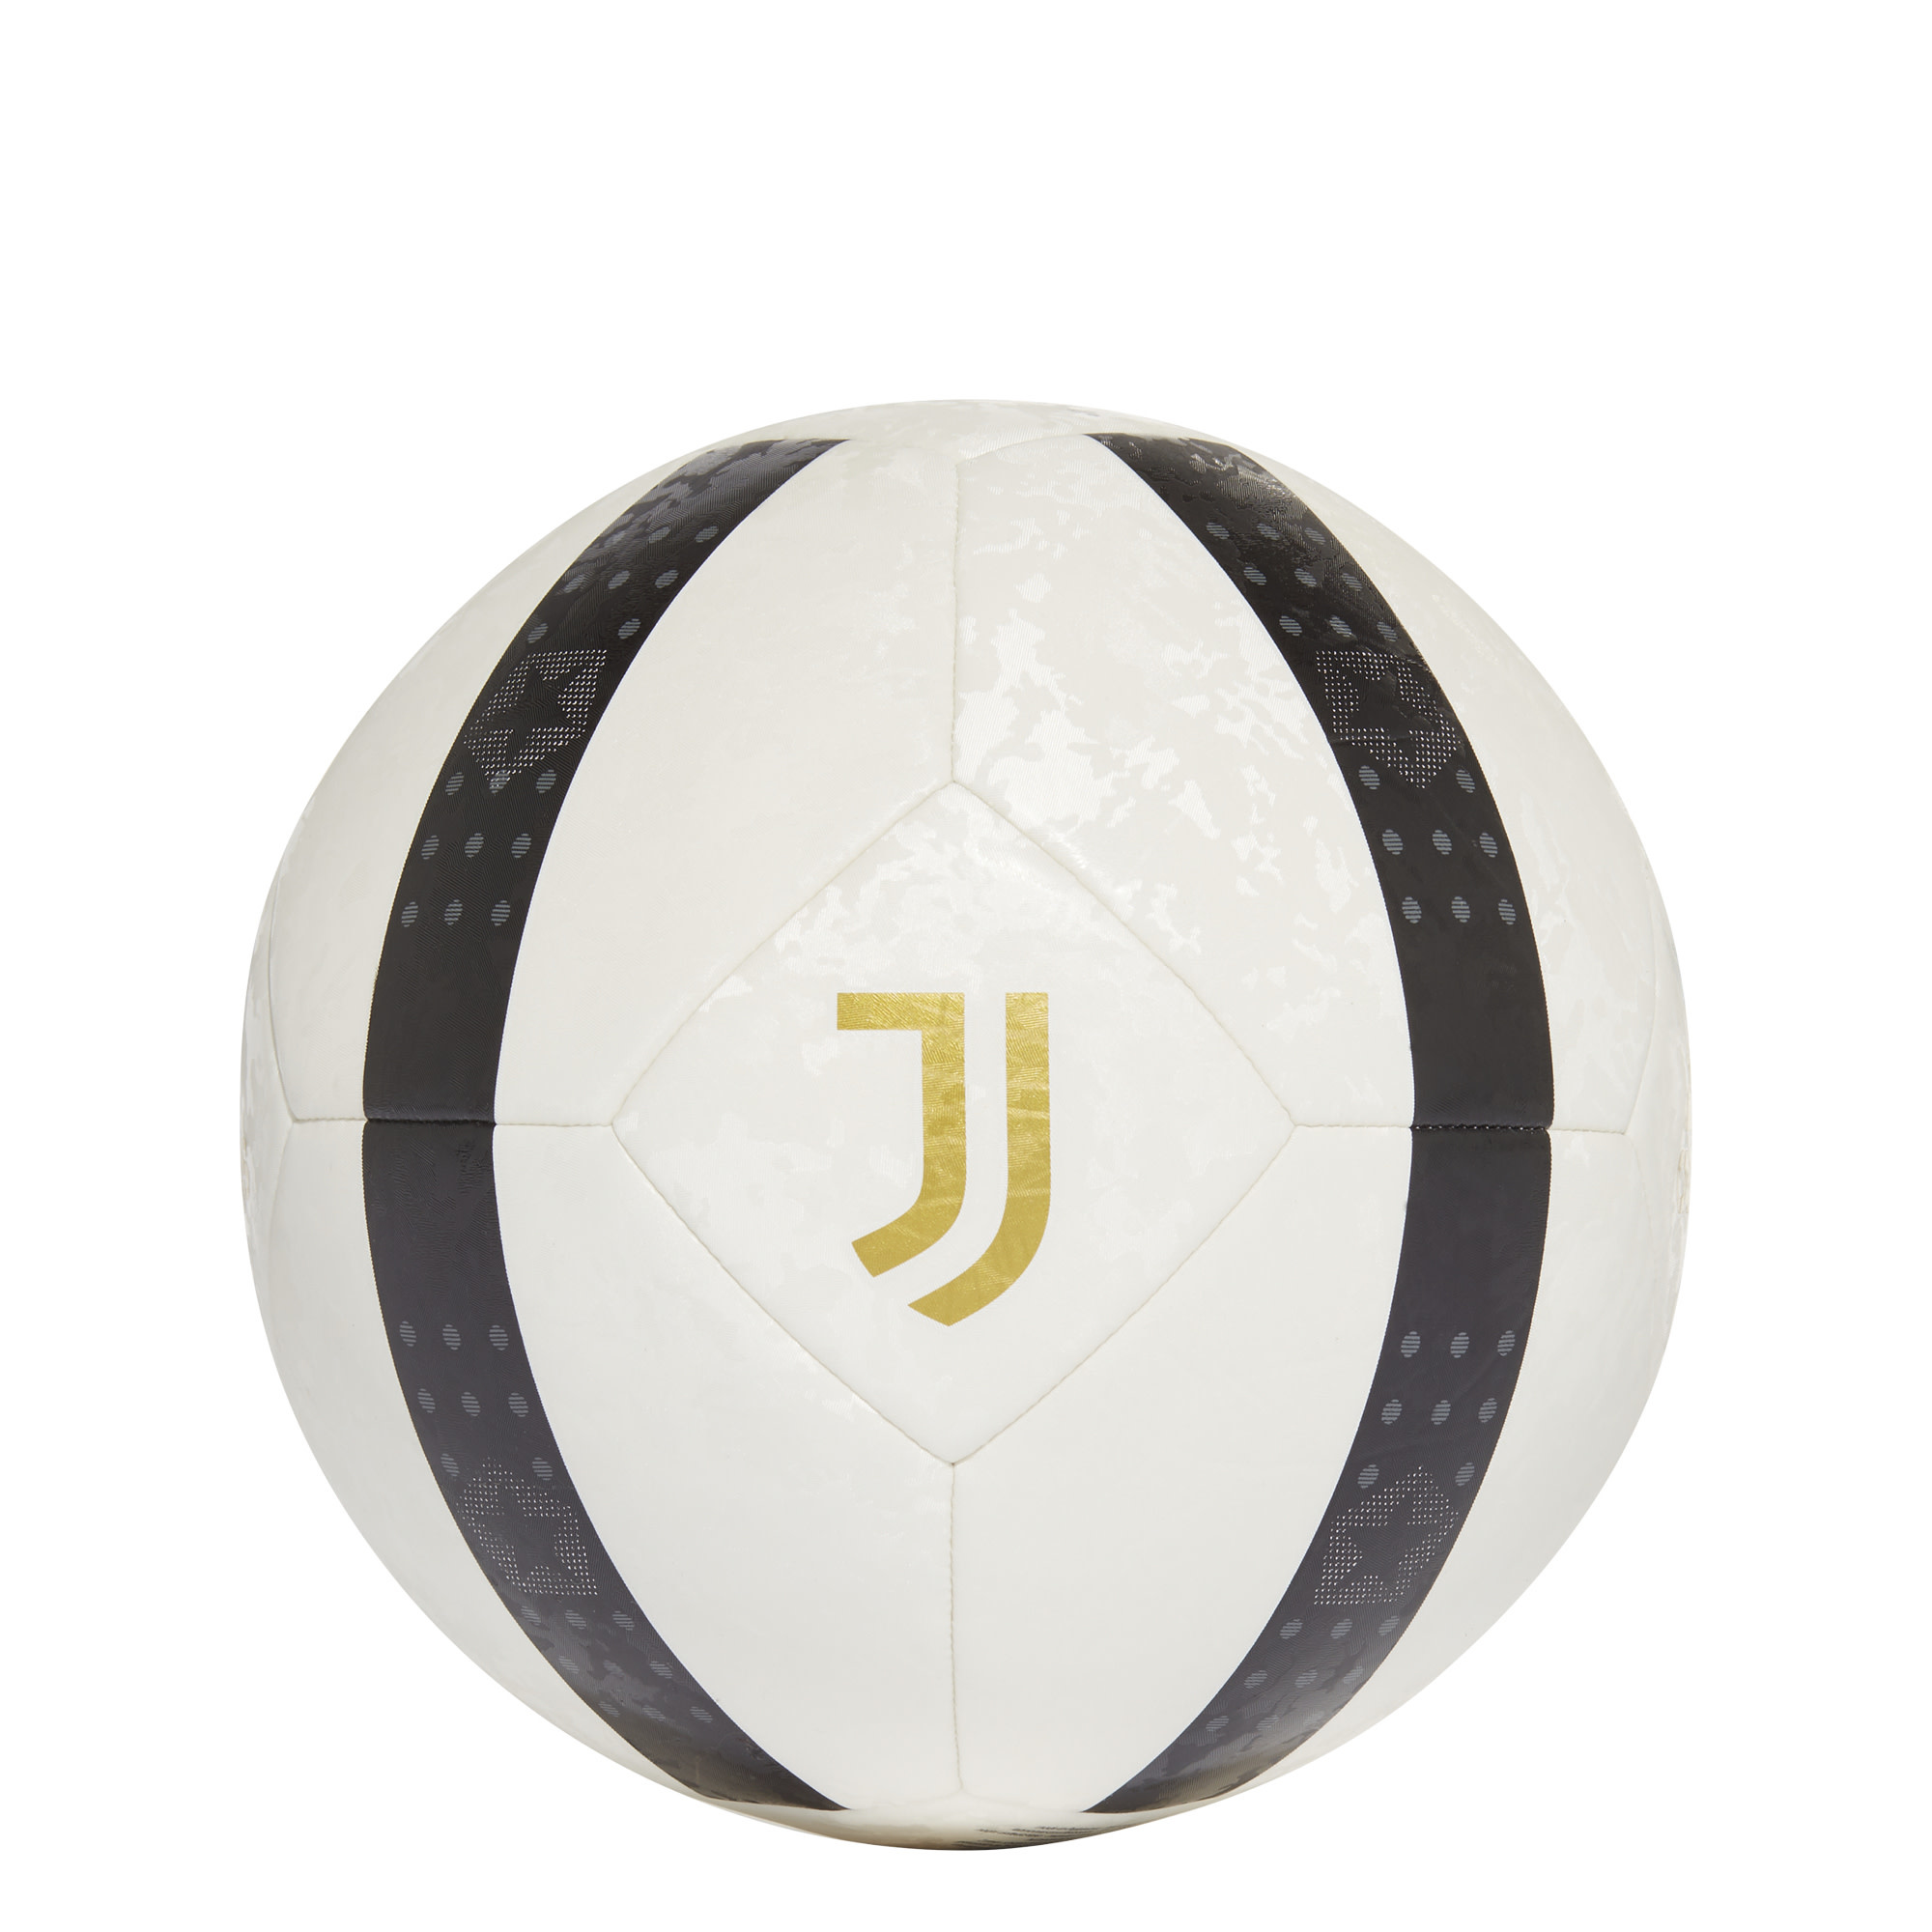 Adidas Juventus CLB Ball